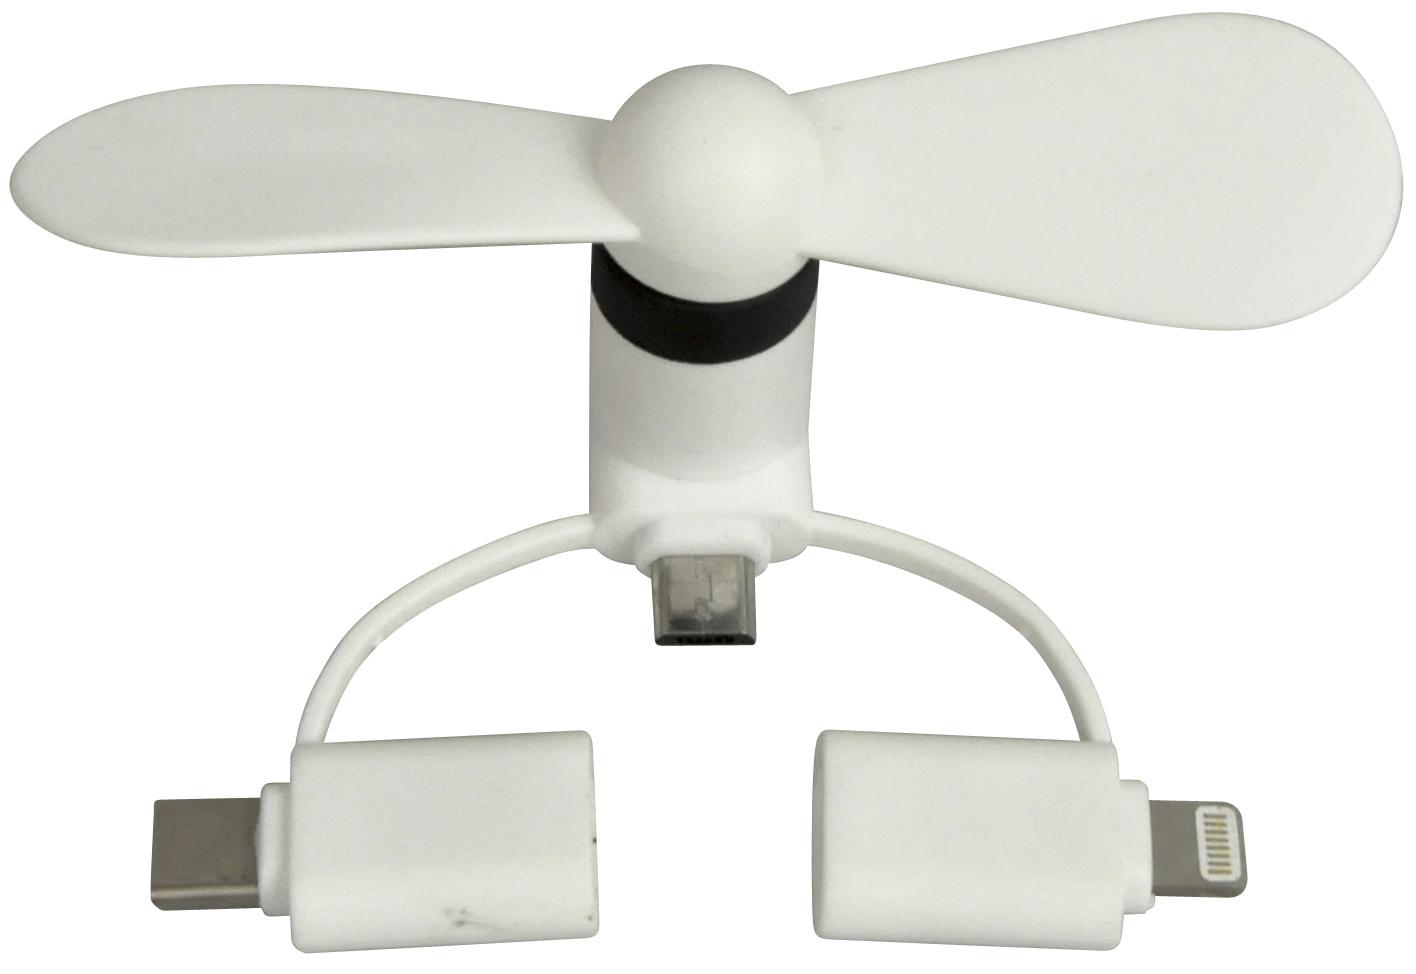 <AMANO>【Mobile Fan】モバイルファン・ホワイト 3WAY=iPhone+microUSBtypeB+USBtypeC